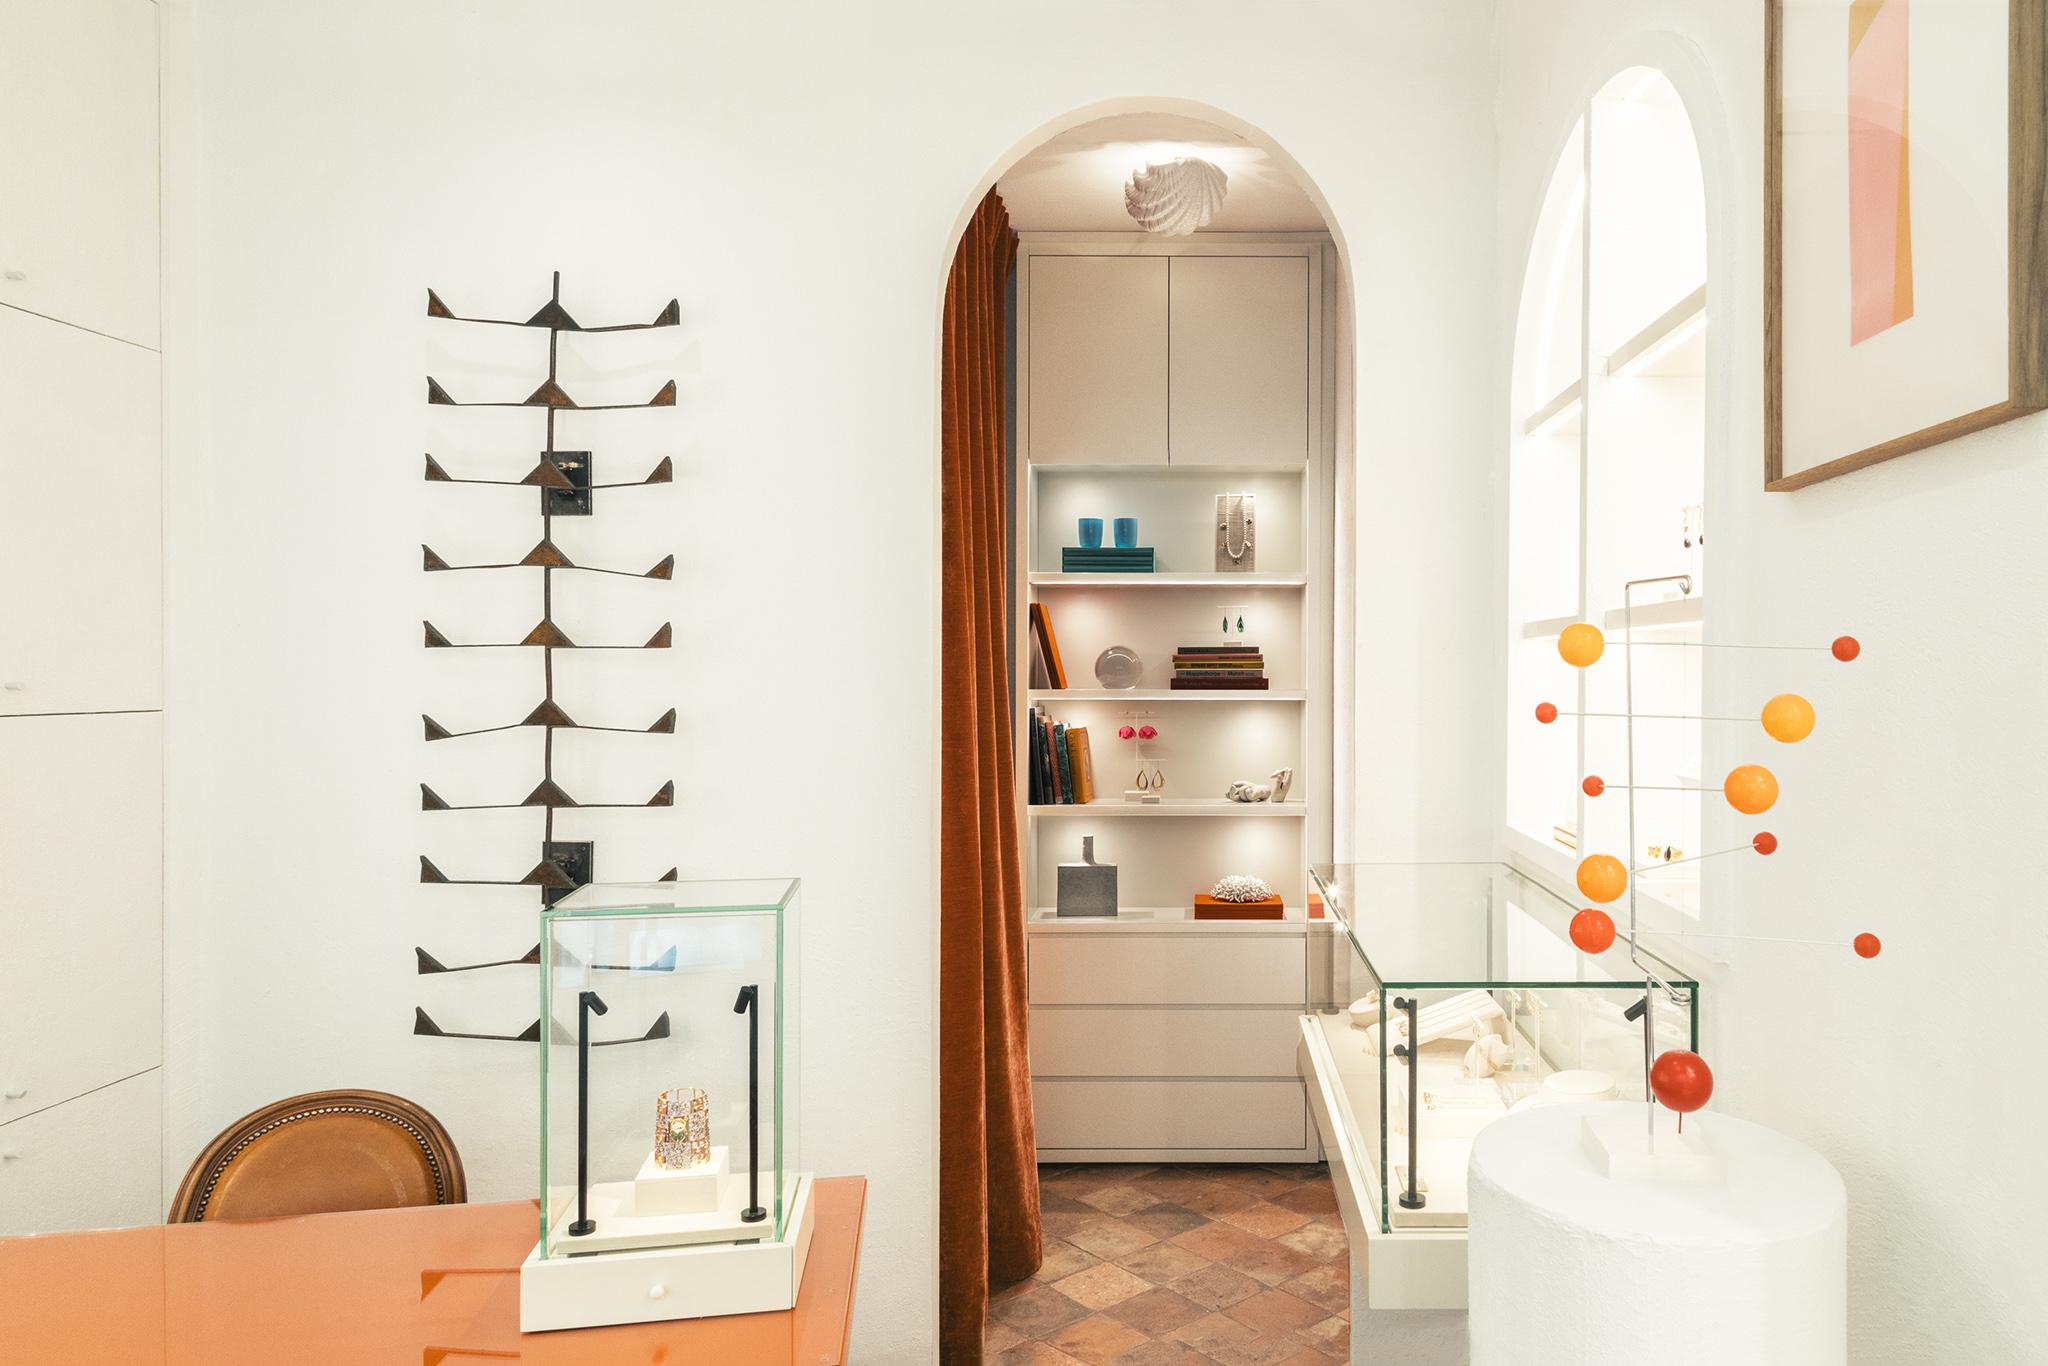 The Aurélie Bidermann store on Rue Royale